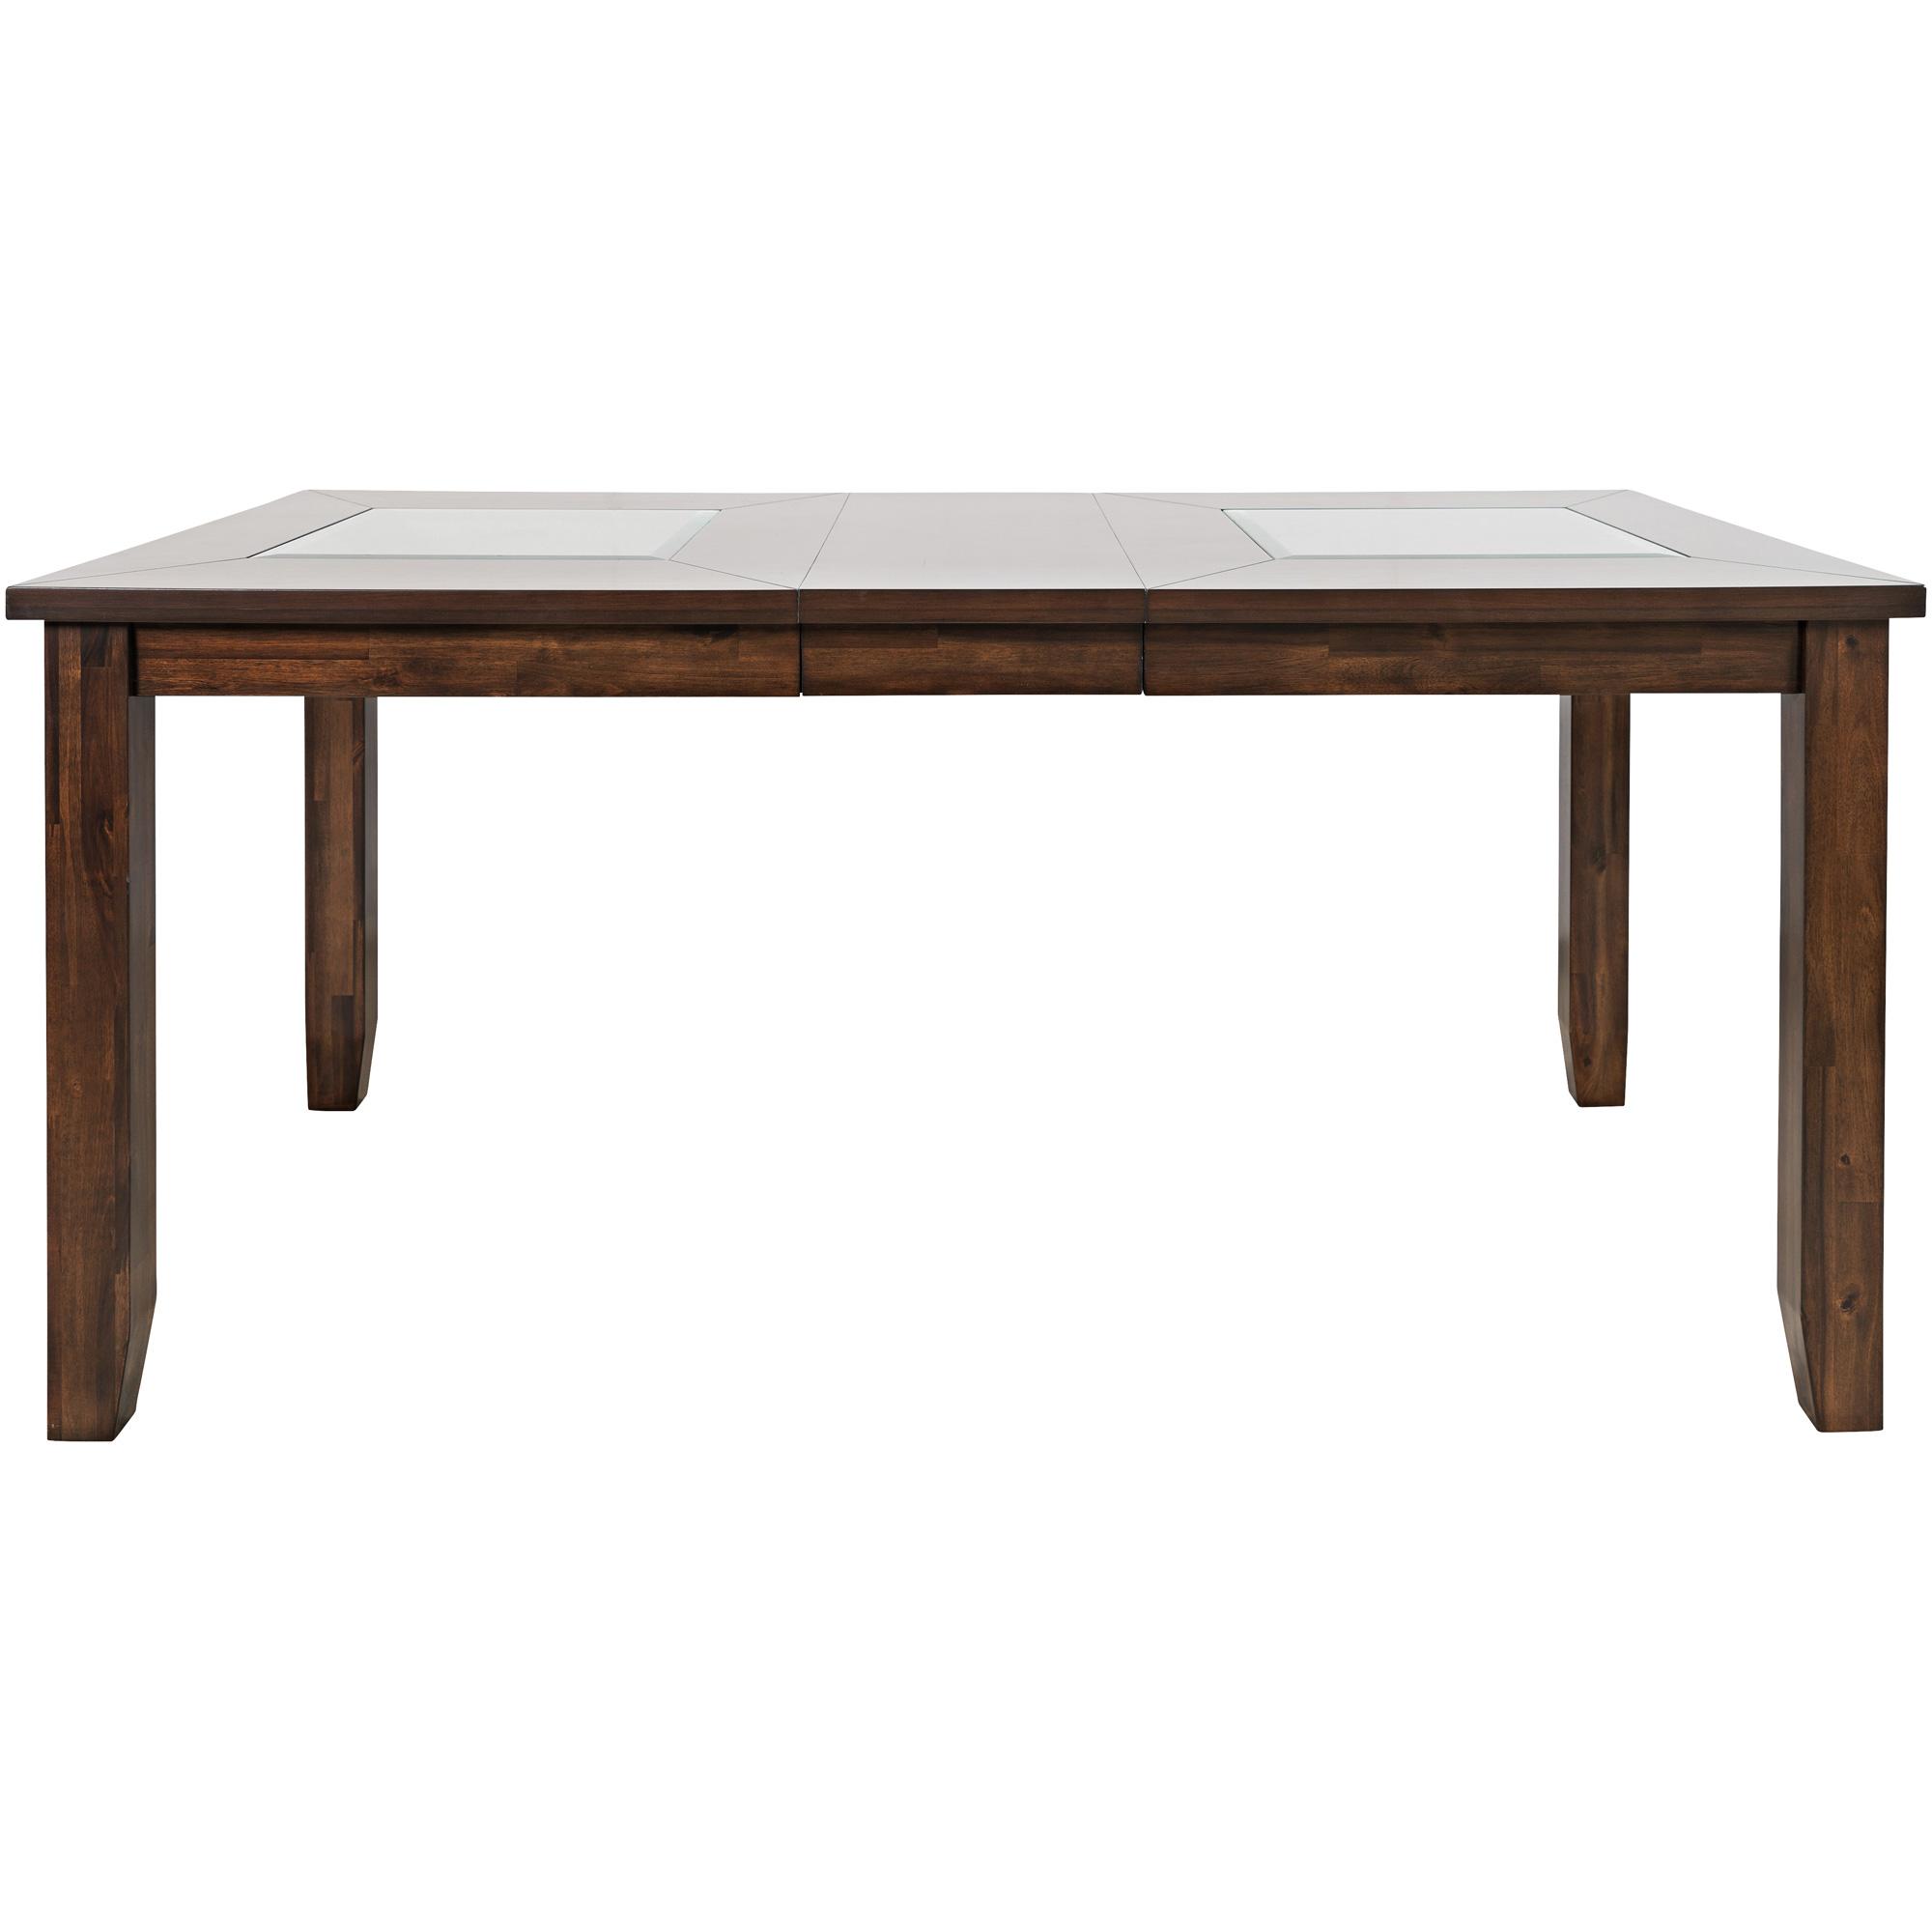 Jofran, Inc. | Urban Icon Merlot Dining Table